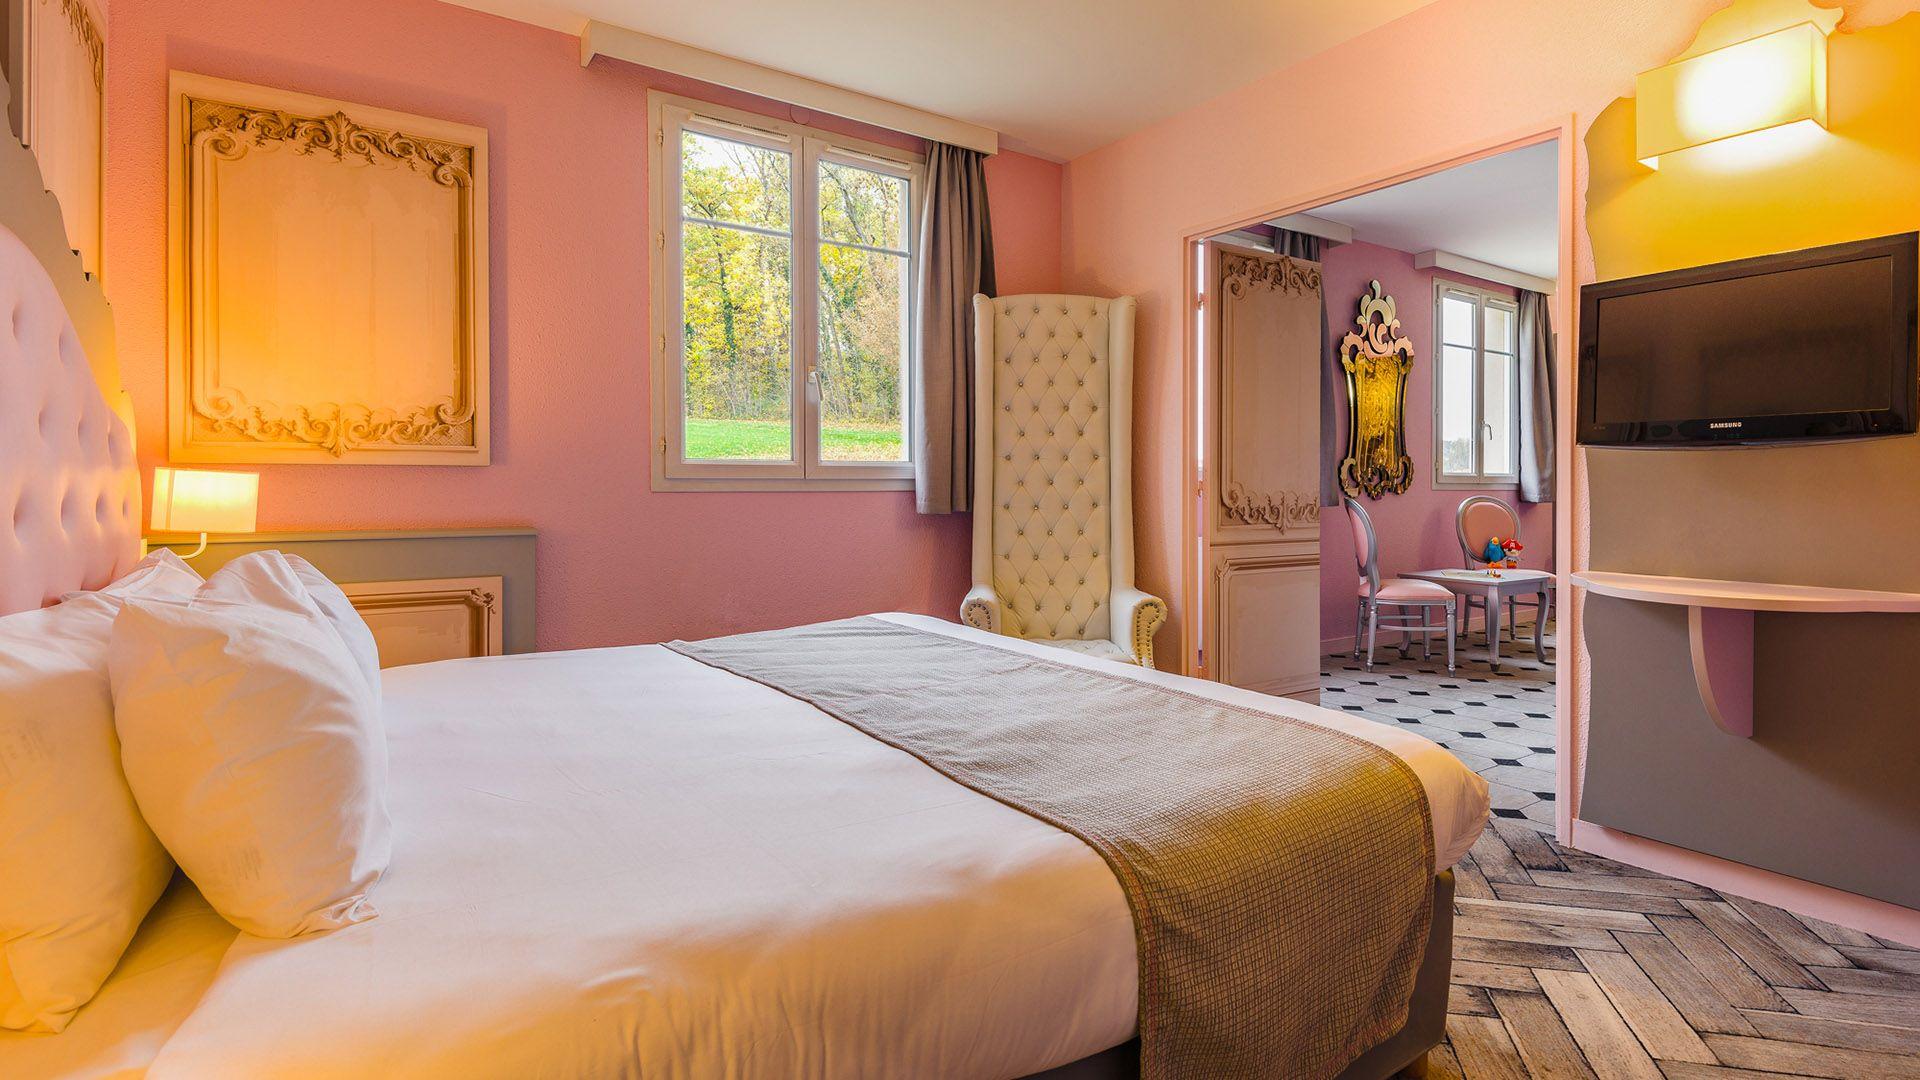 knights and princesses suites disneyland paris hotel explorers